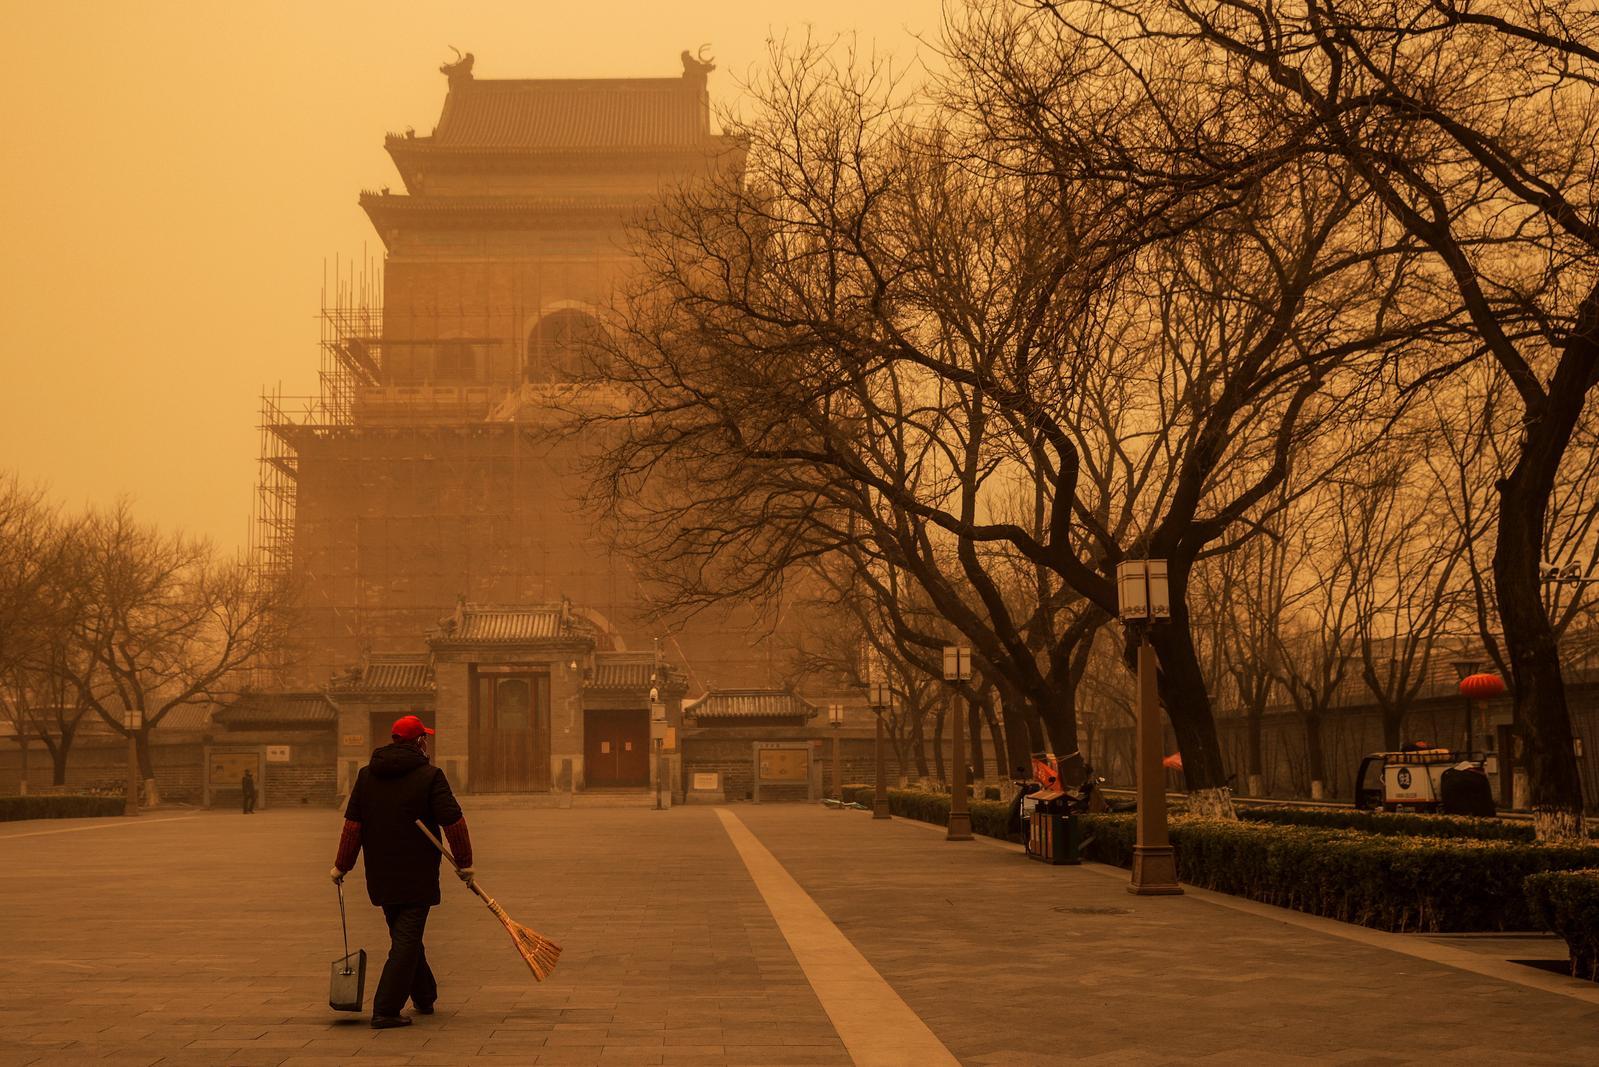 Beijing choked in duststorm amid heavy northwest winds